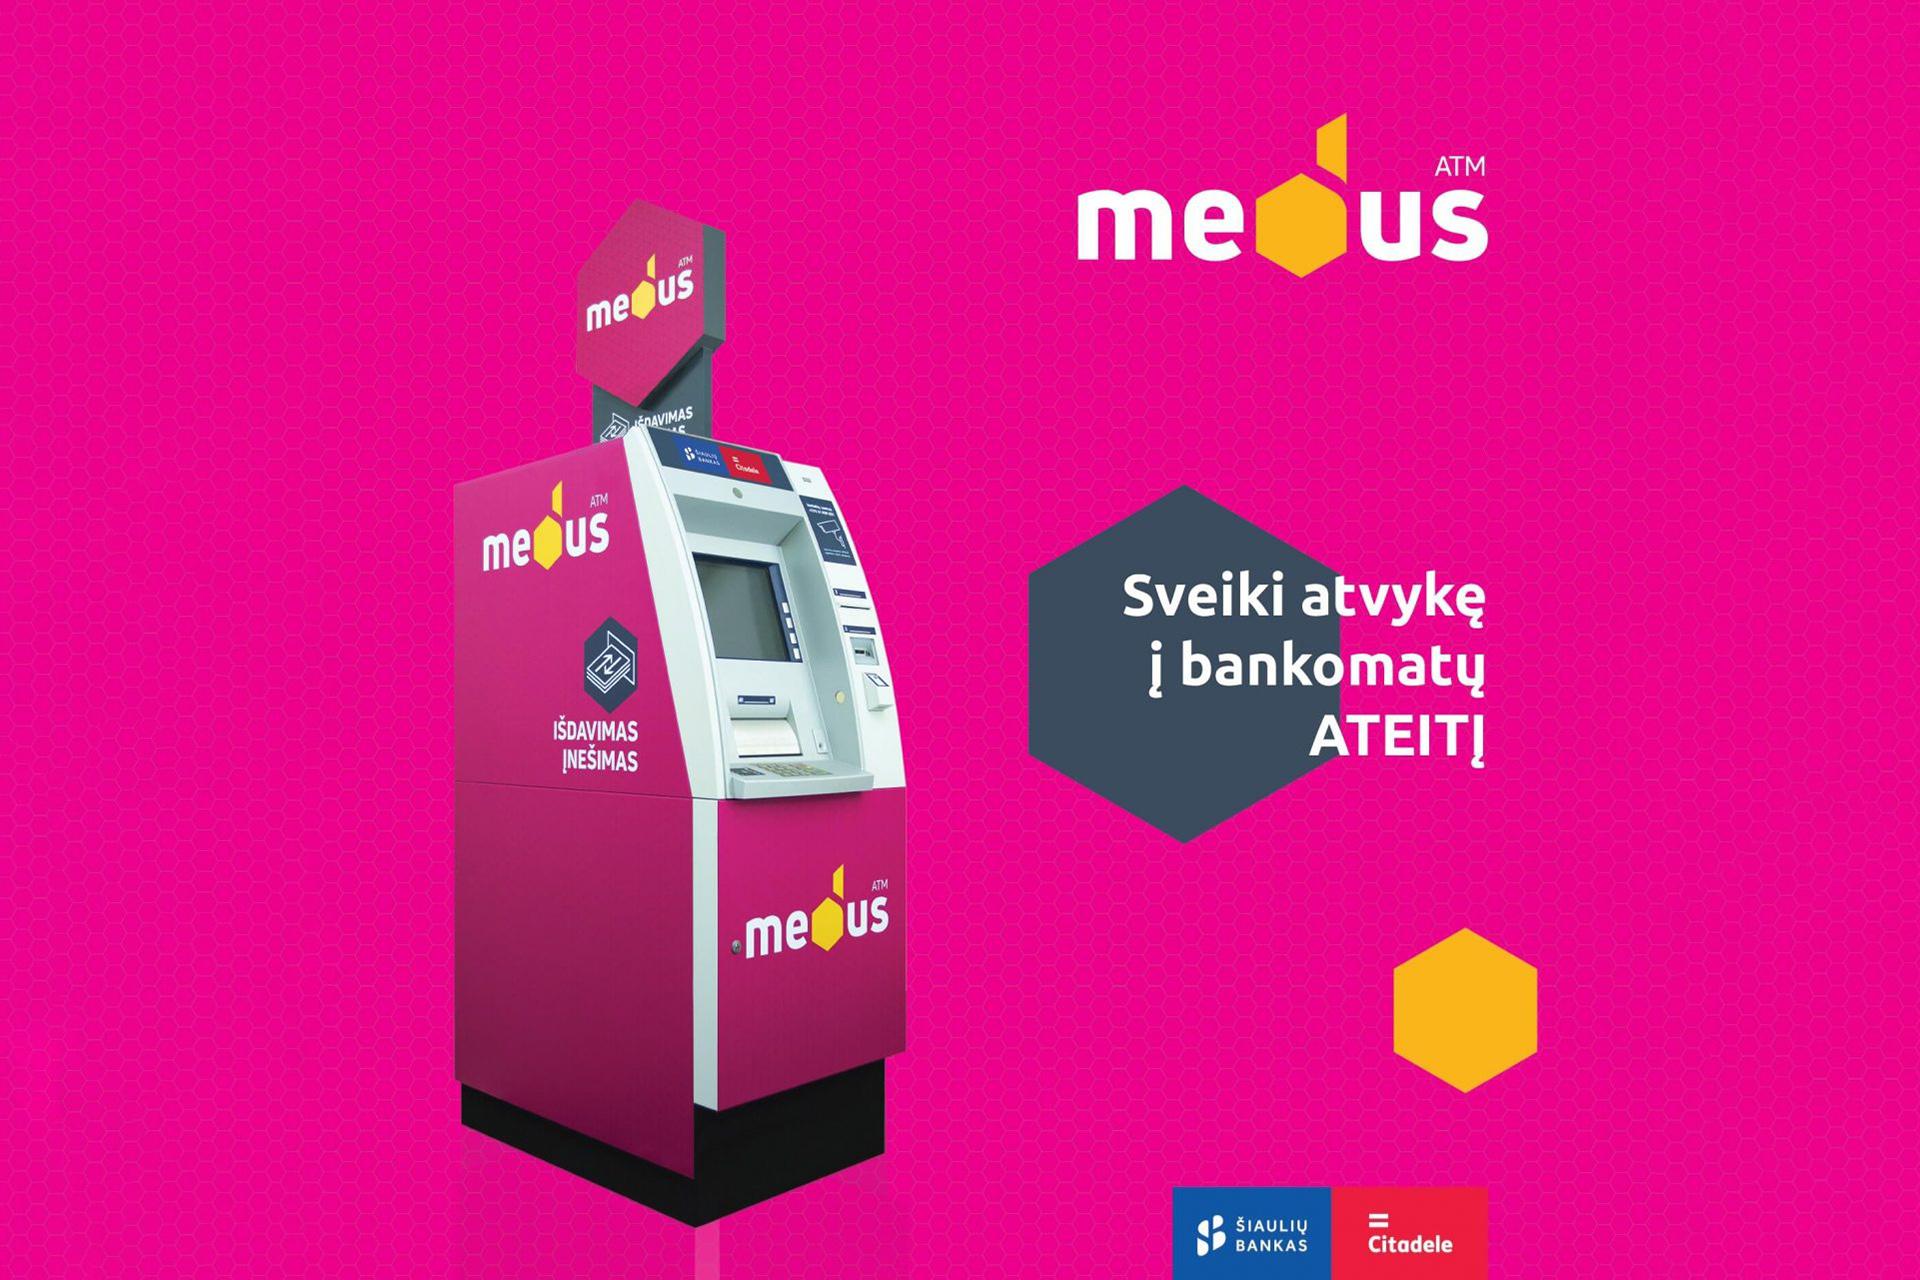 https://neriesunija.lt/wp-content/uploads/Kredito-Unija-Neris-Bankomatas-Medus-1920x1280-1.jpg